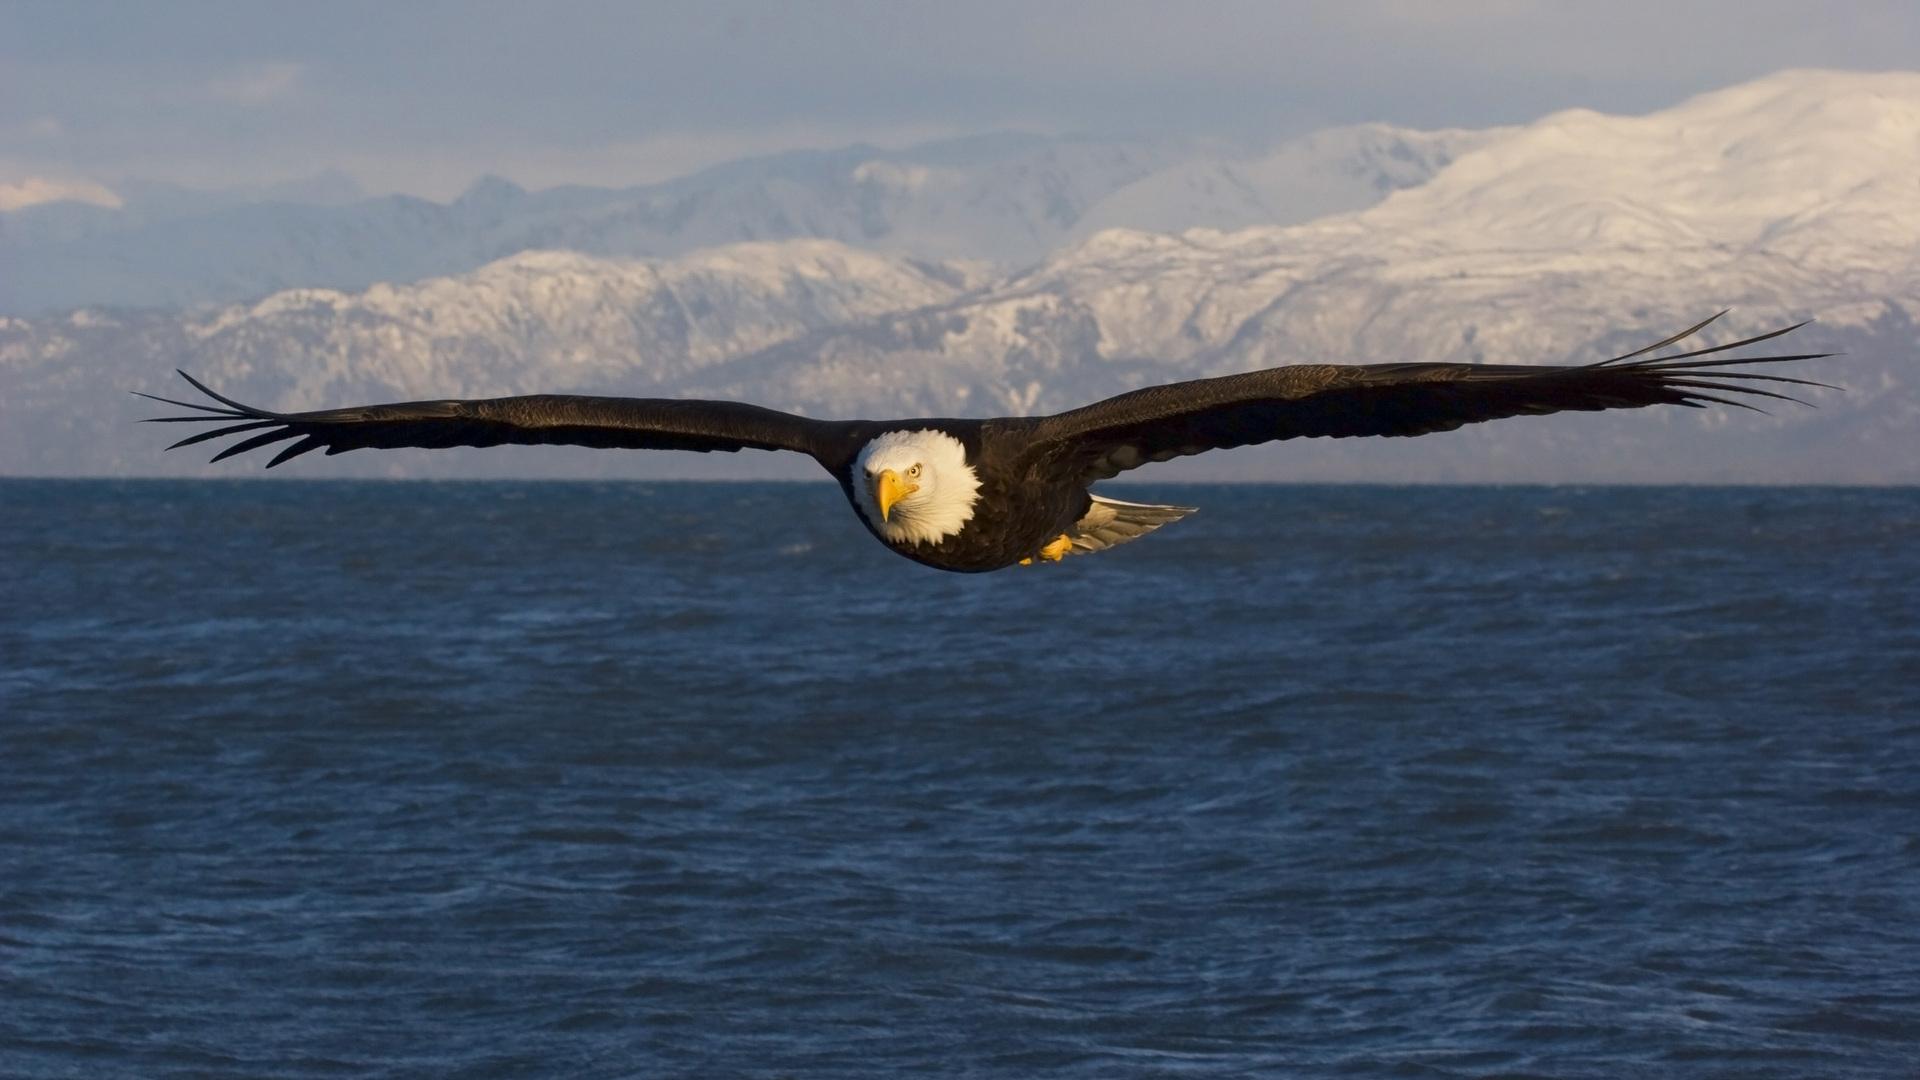 Flying eagle wallpaper 50059 1920x1080px flying eagle wallpaper 50059 altavistaventures Gallery